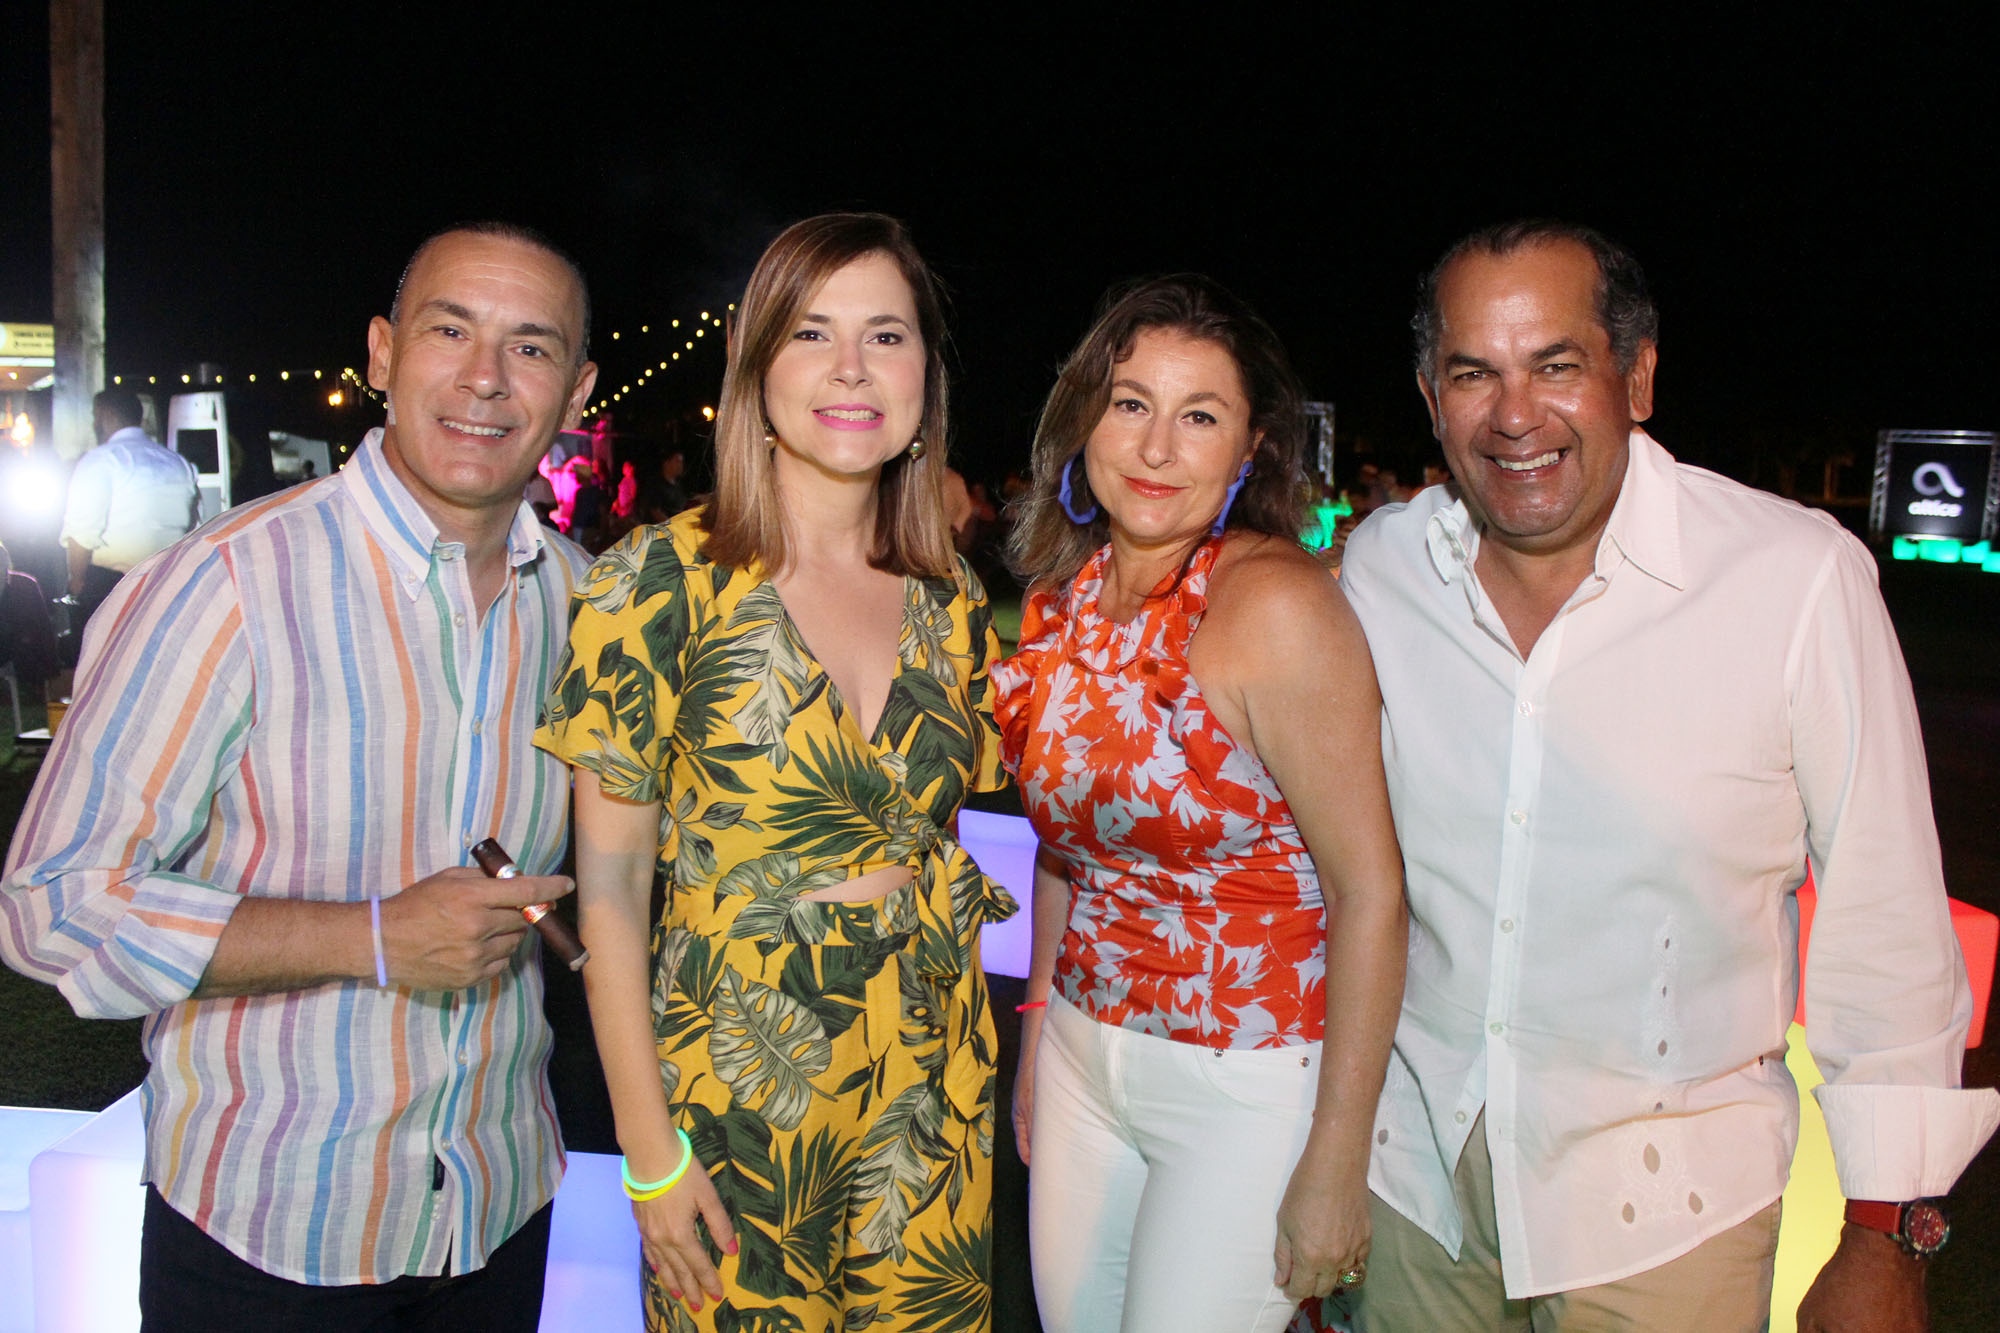 3.Manuel Sajour, Claudia de Sajour, Patricia Salazar y Reyerson Pimentel